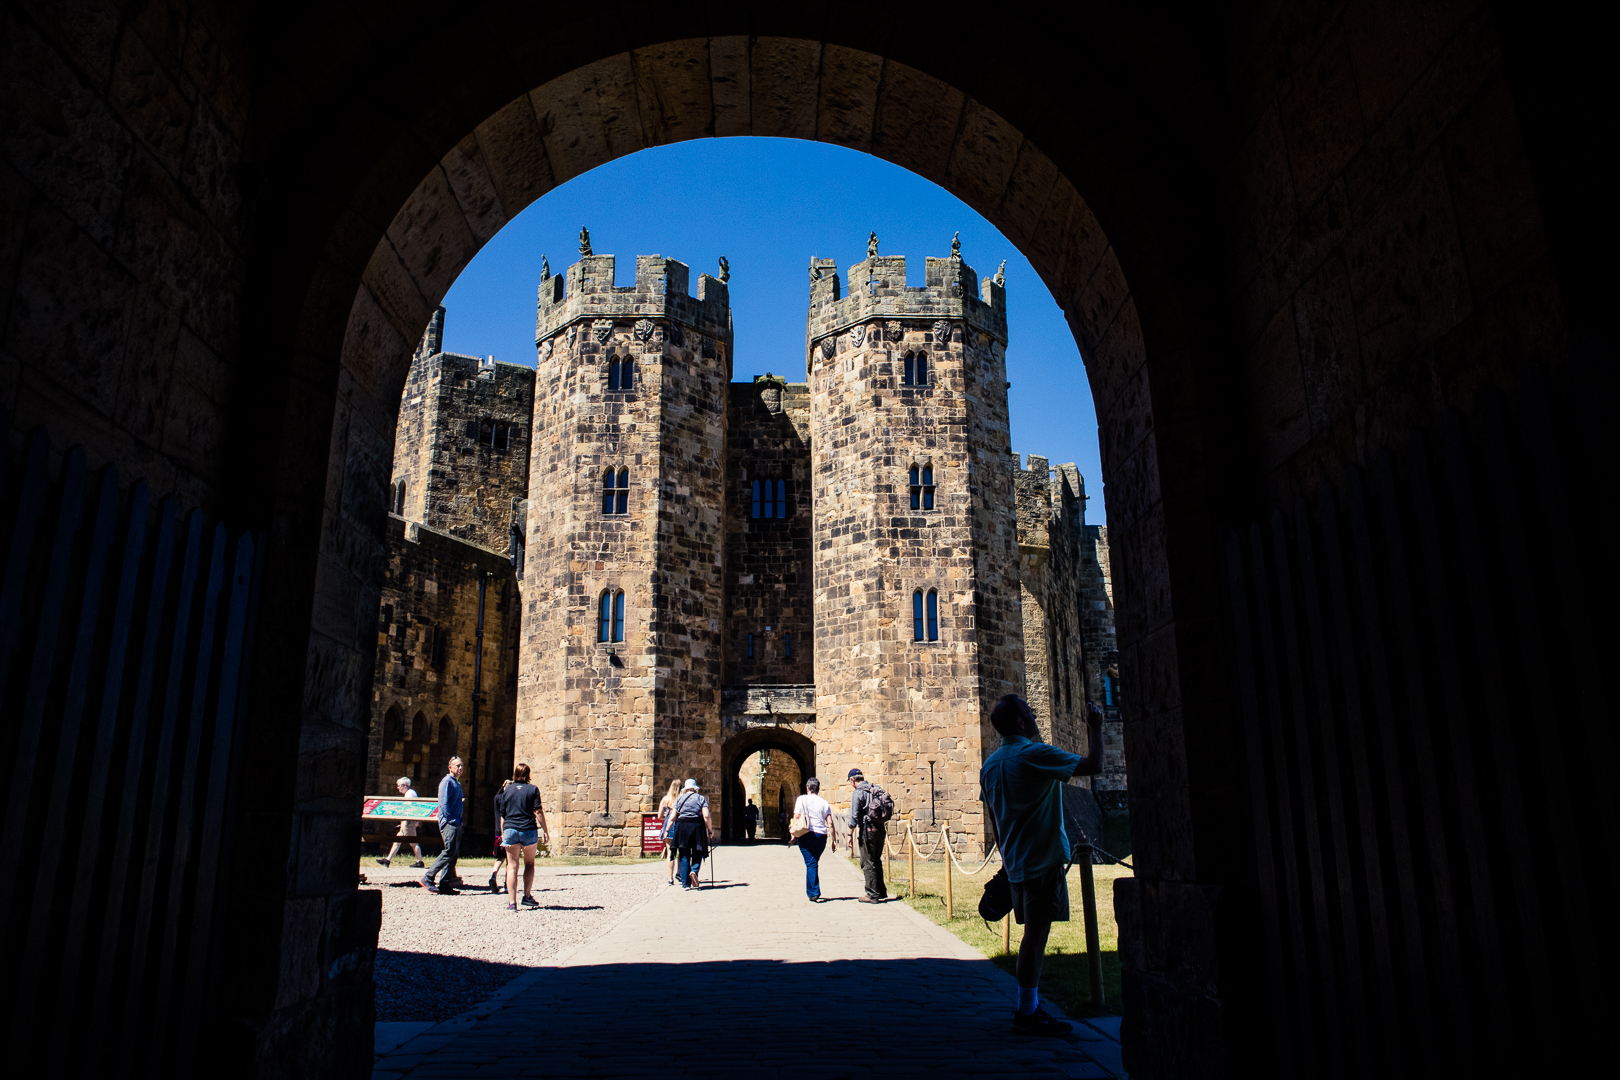 Alnwick Castle in Northumberland England